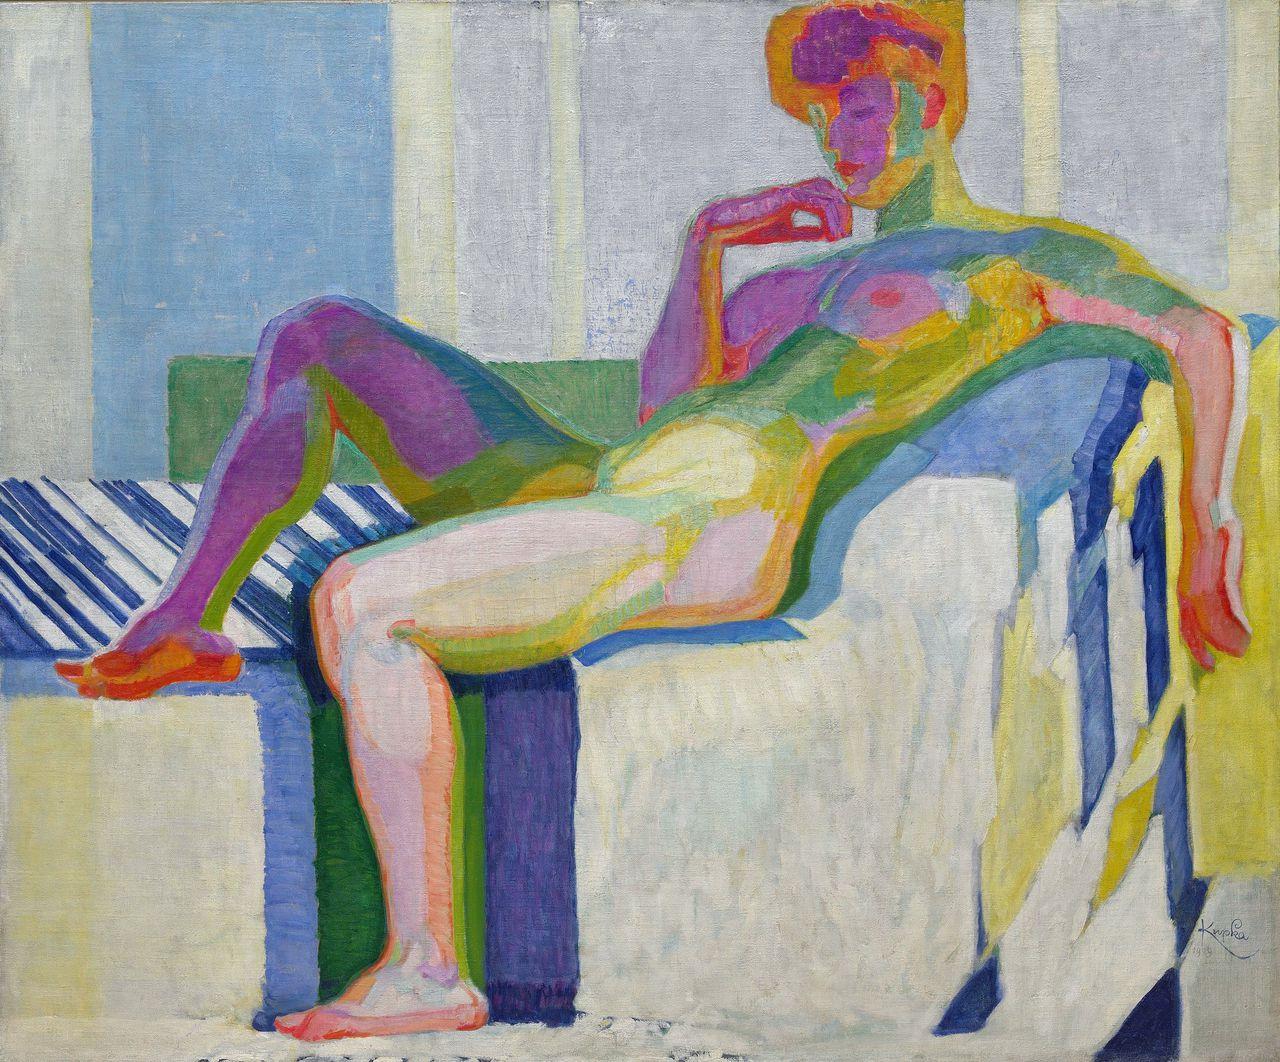 Frantisek Kupka, Grand nu. Plans par couleurs, 1909-1910. Olieverf op doek, 150,2×180,7 cm.